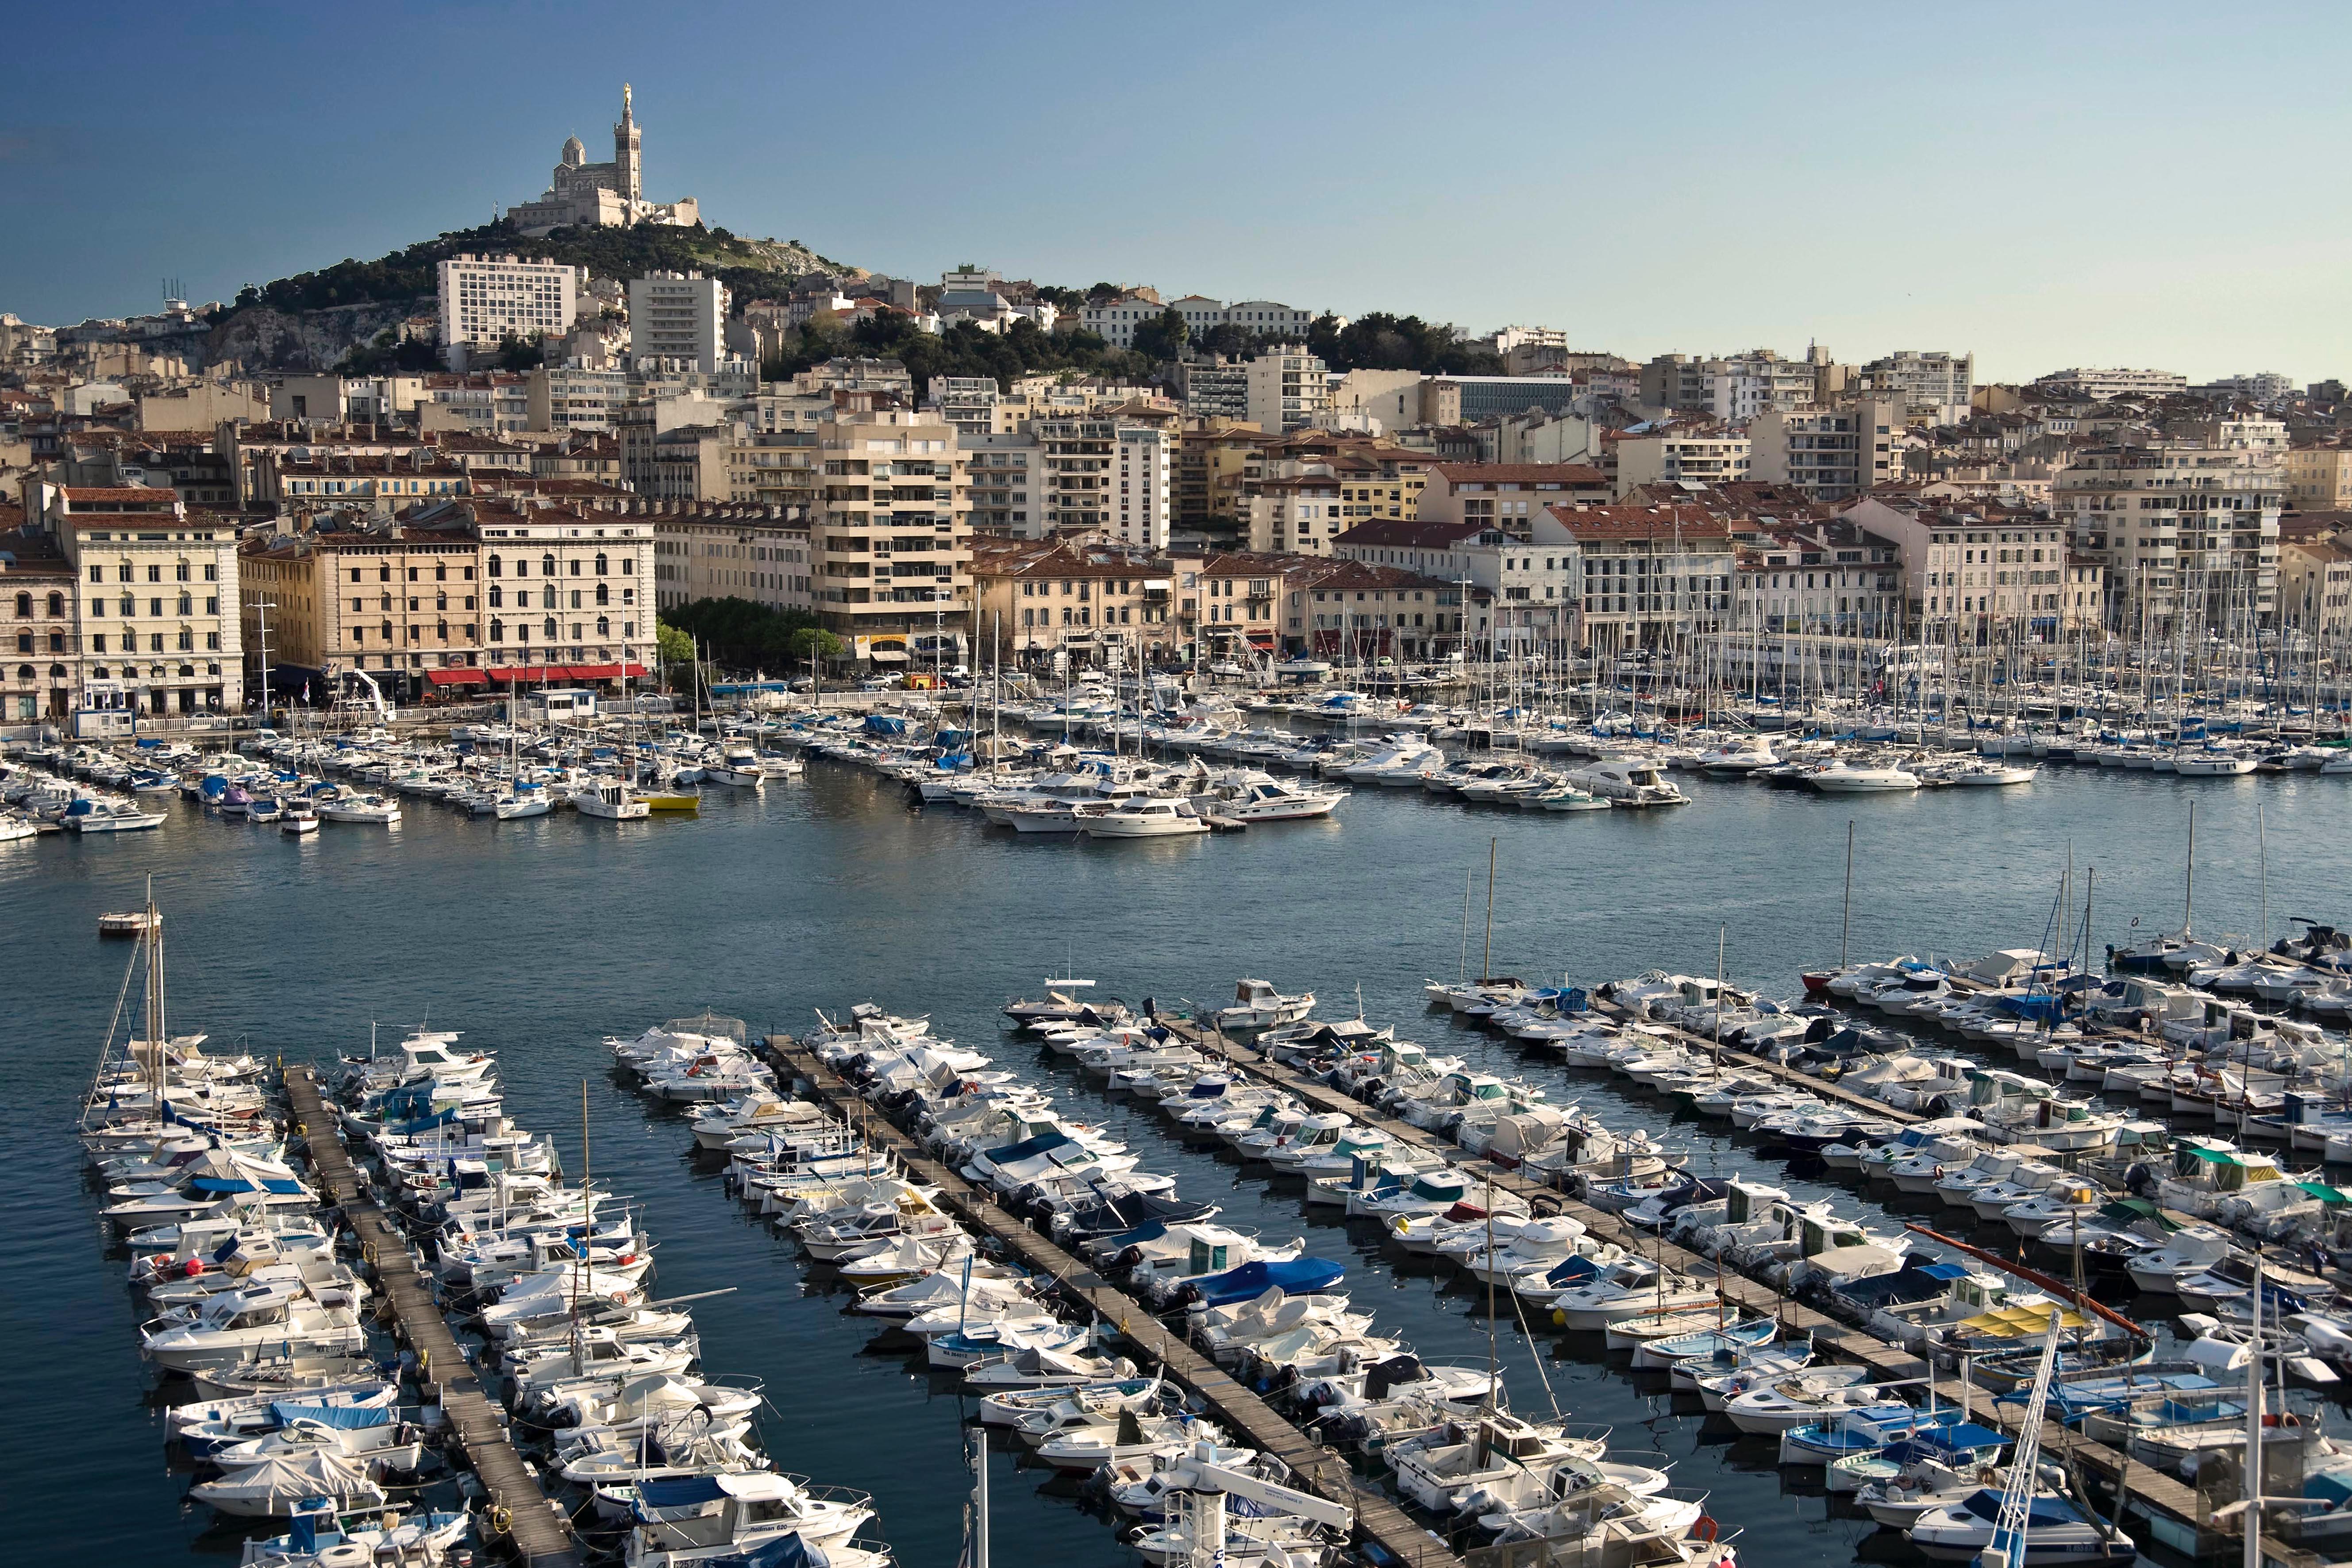 OTCM-Vieux-Port